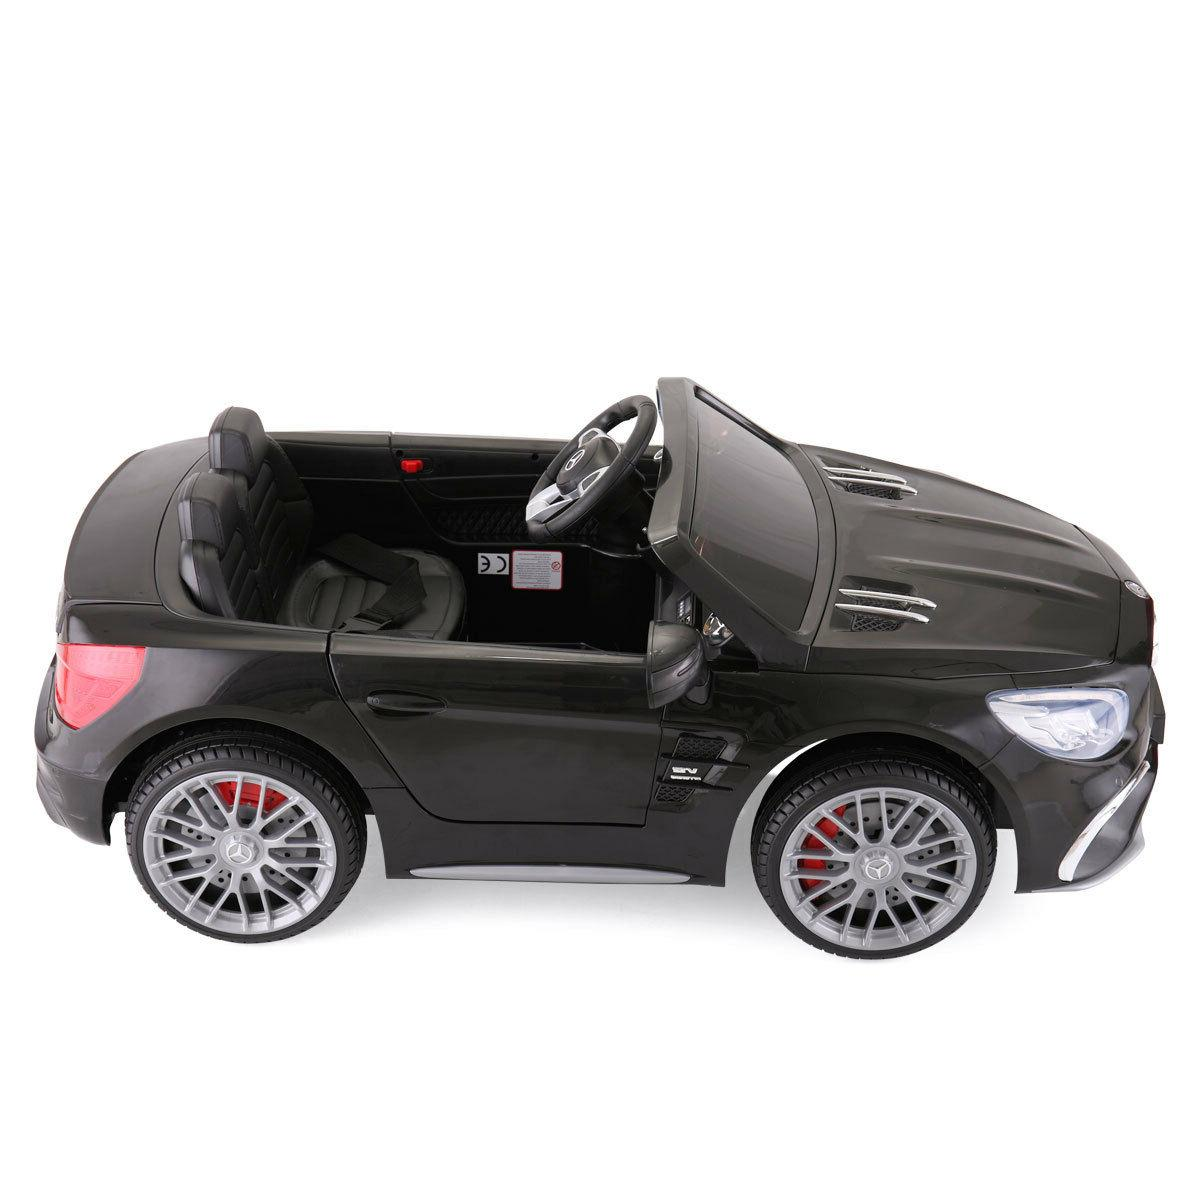 12V Mercedes Benz Kids On With Remote Control Black